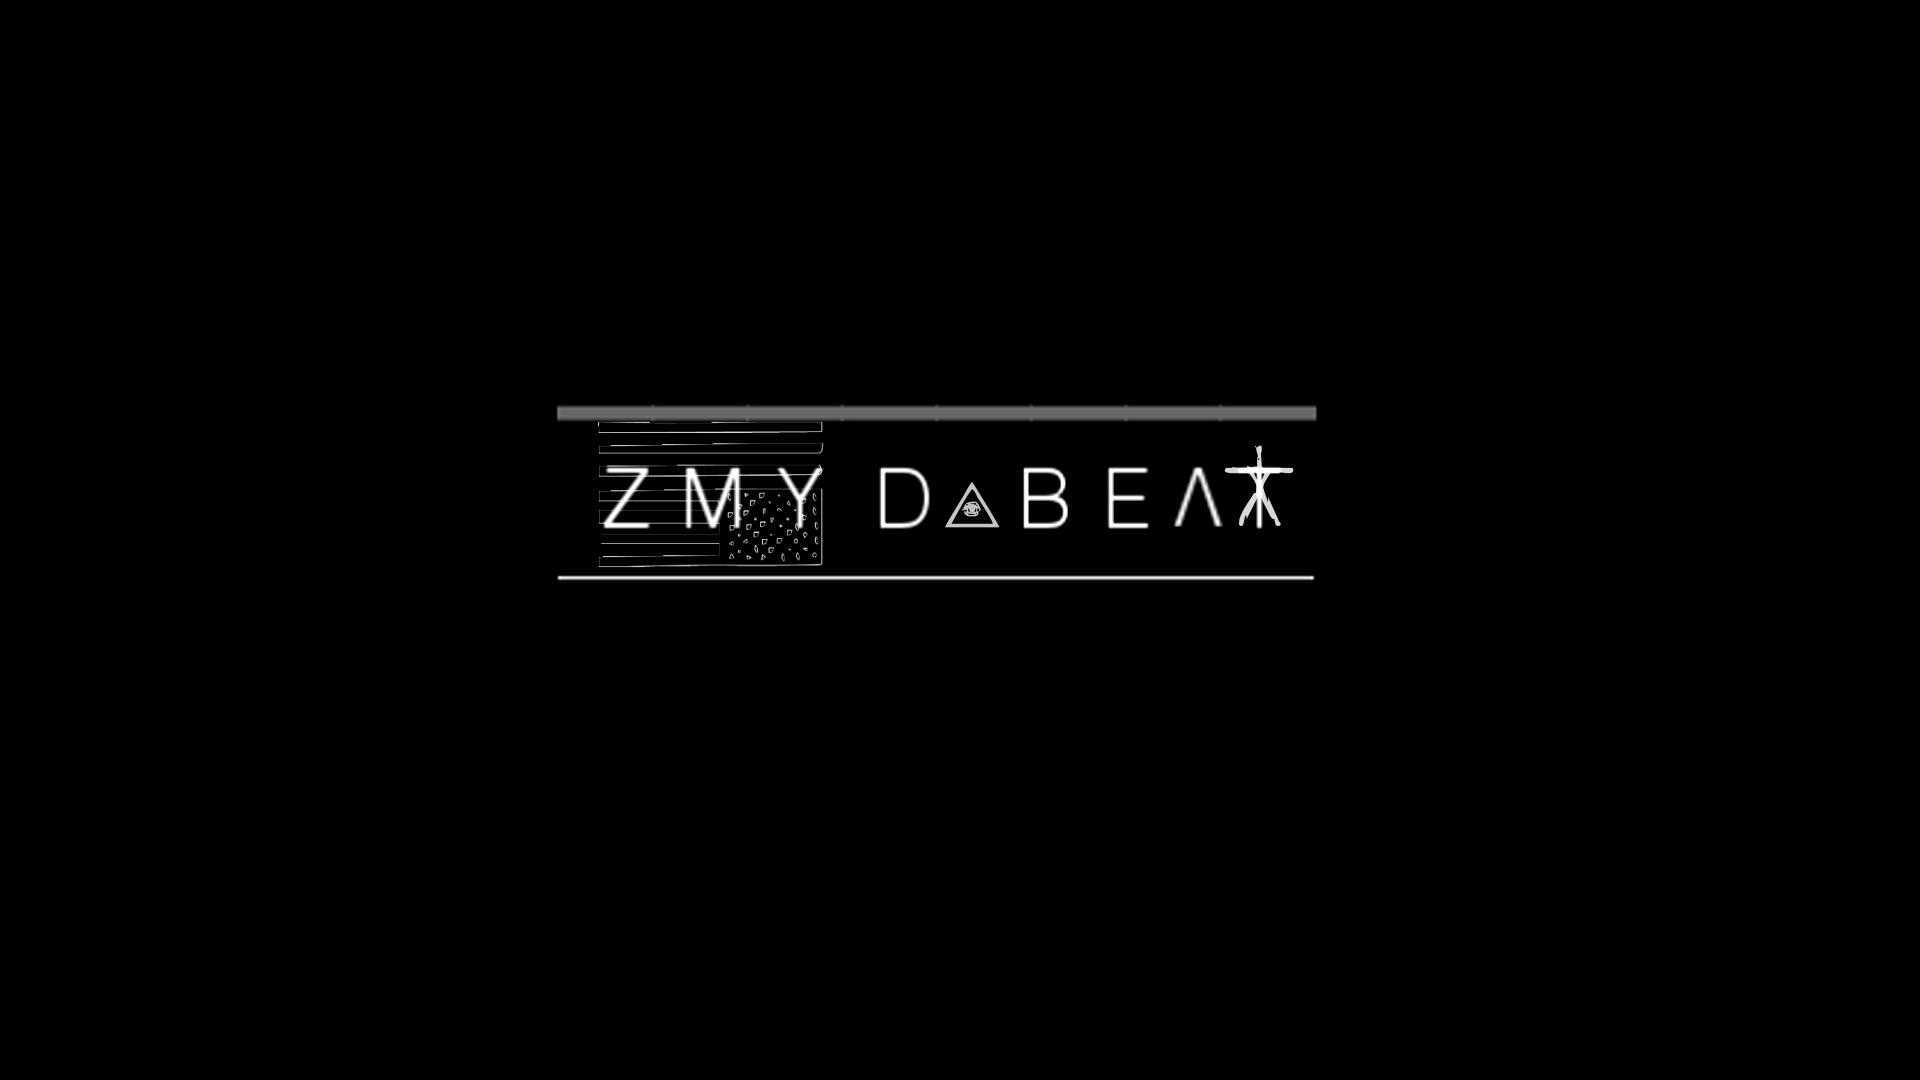 """B.A.D. - H.O.O.D."" ► Rap Beat Instrumental {Hard Banger} Prod. by ZMY DaBeat"